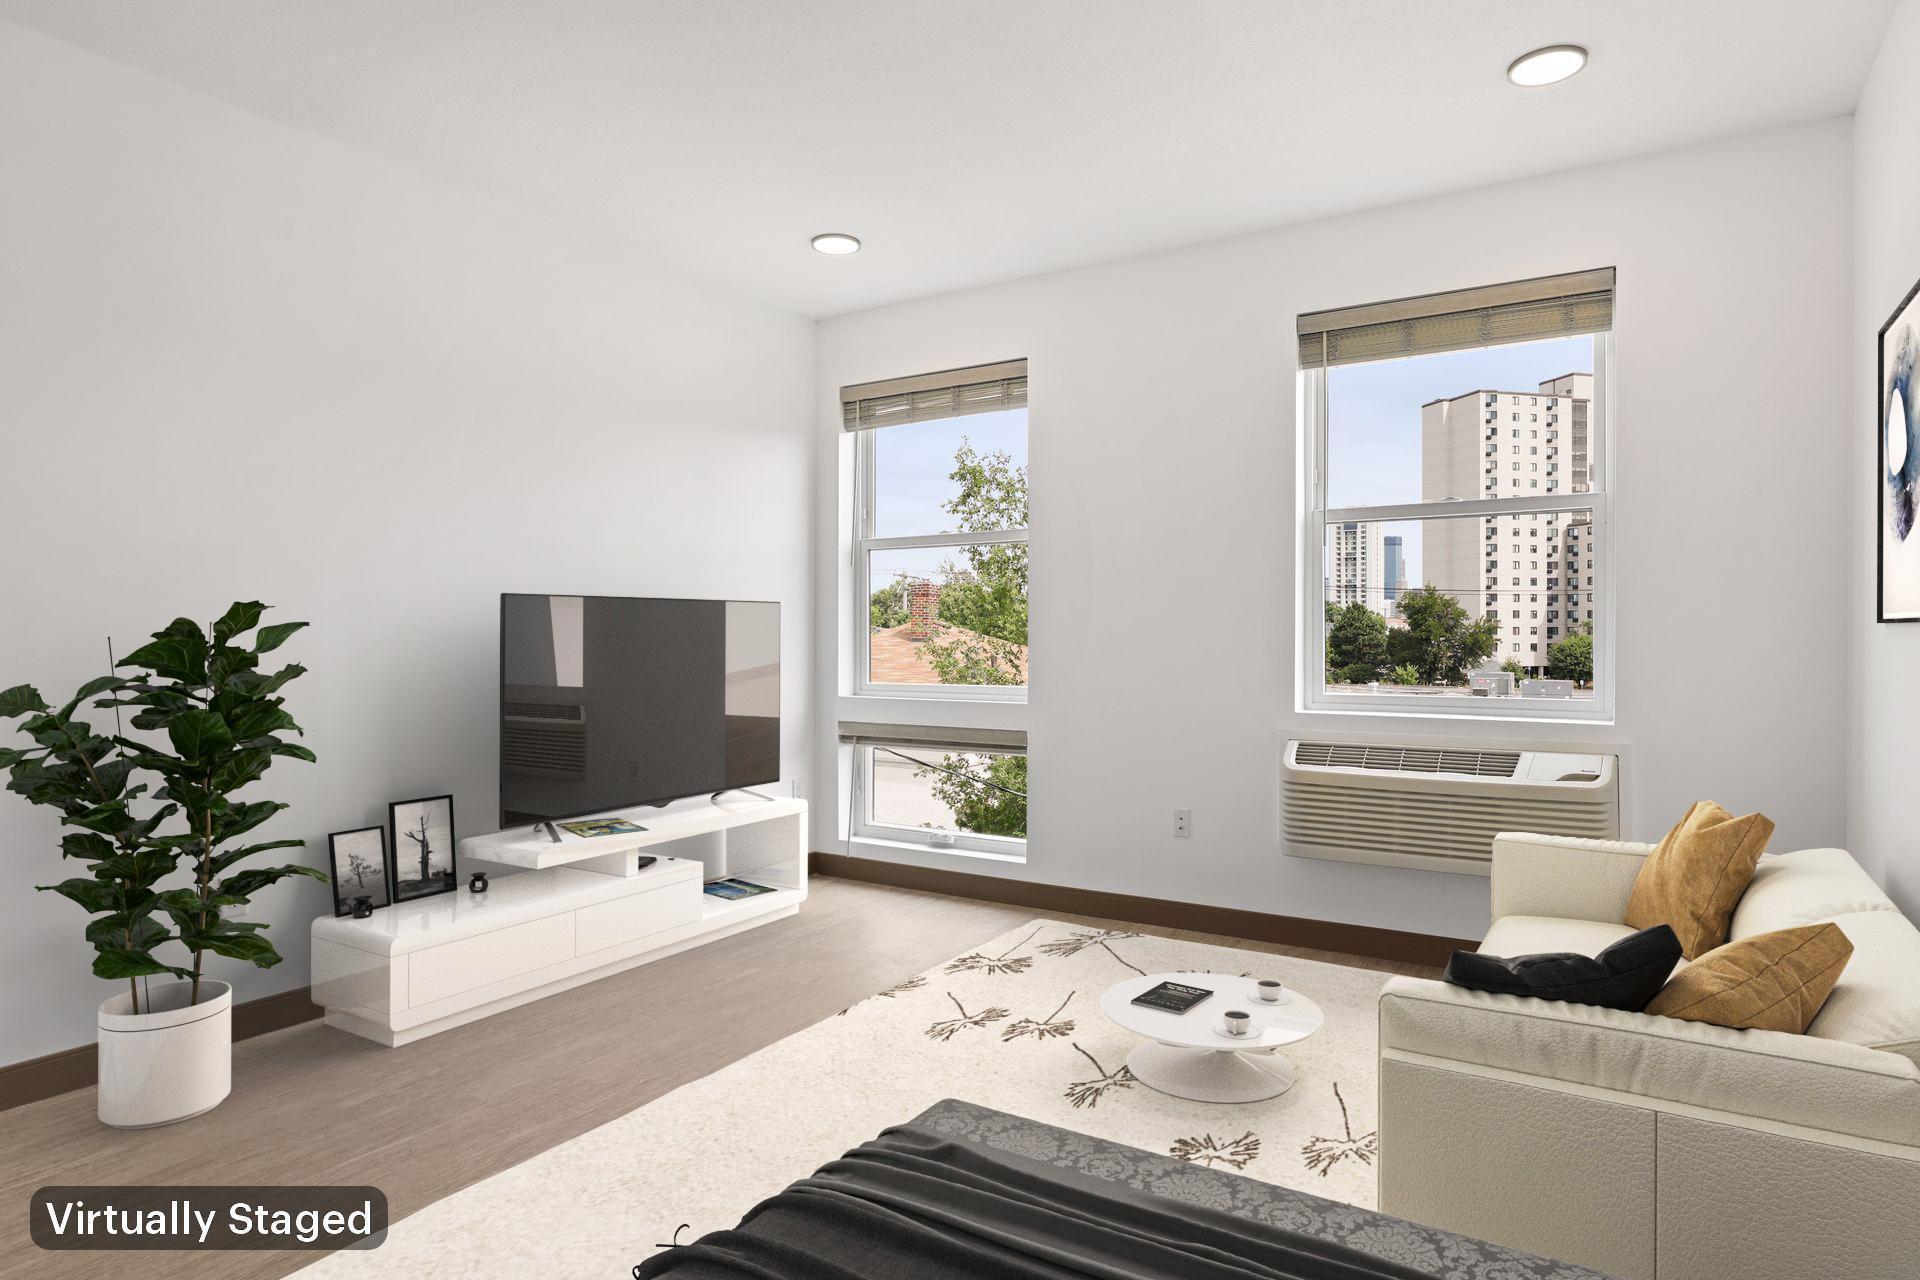 2810 Park Avenue, Minneapolis, Minnesota 55415, ,1 BathroomBathrooms,Residential Lease,For Sale,Park,NST6109765